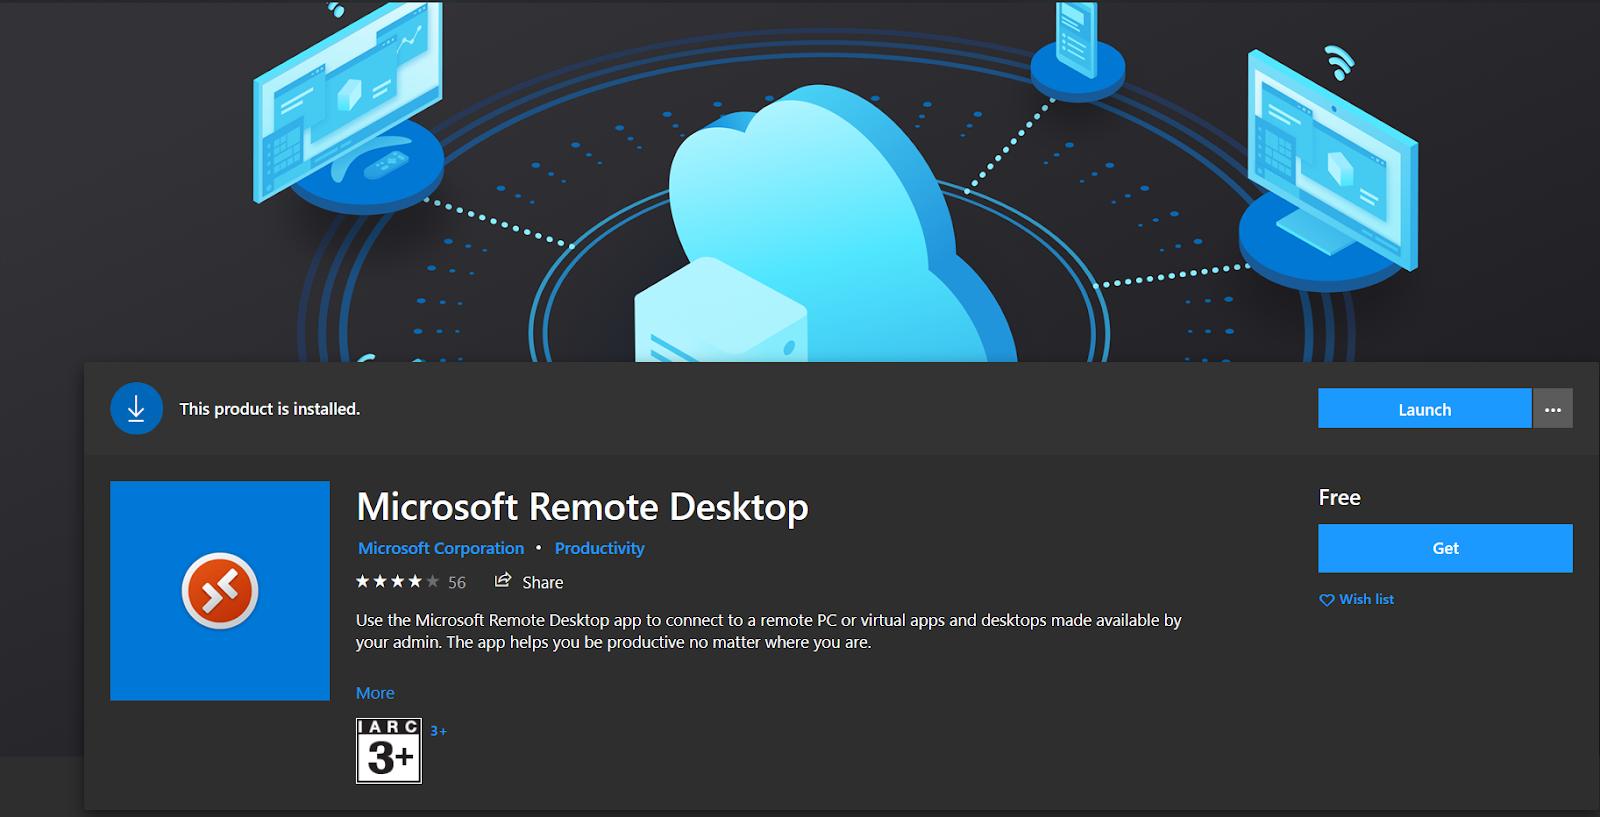 MS Remote Desktop in MS store